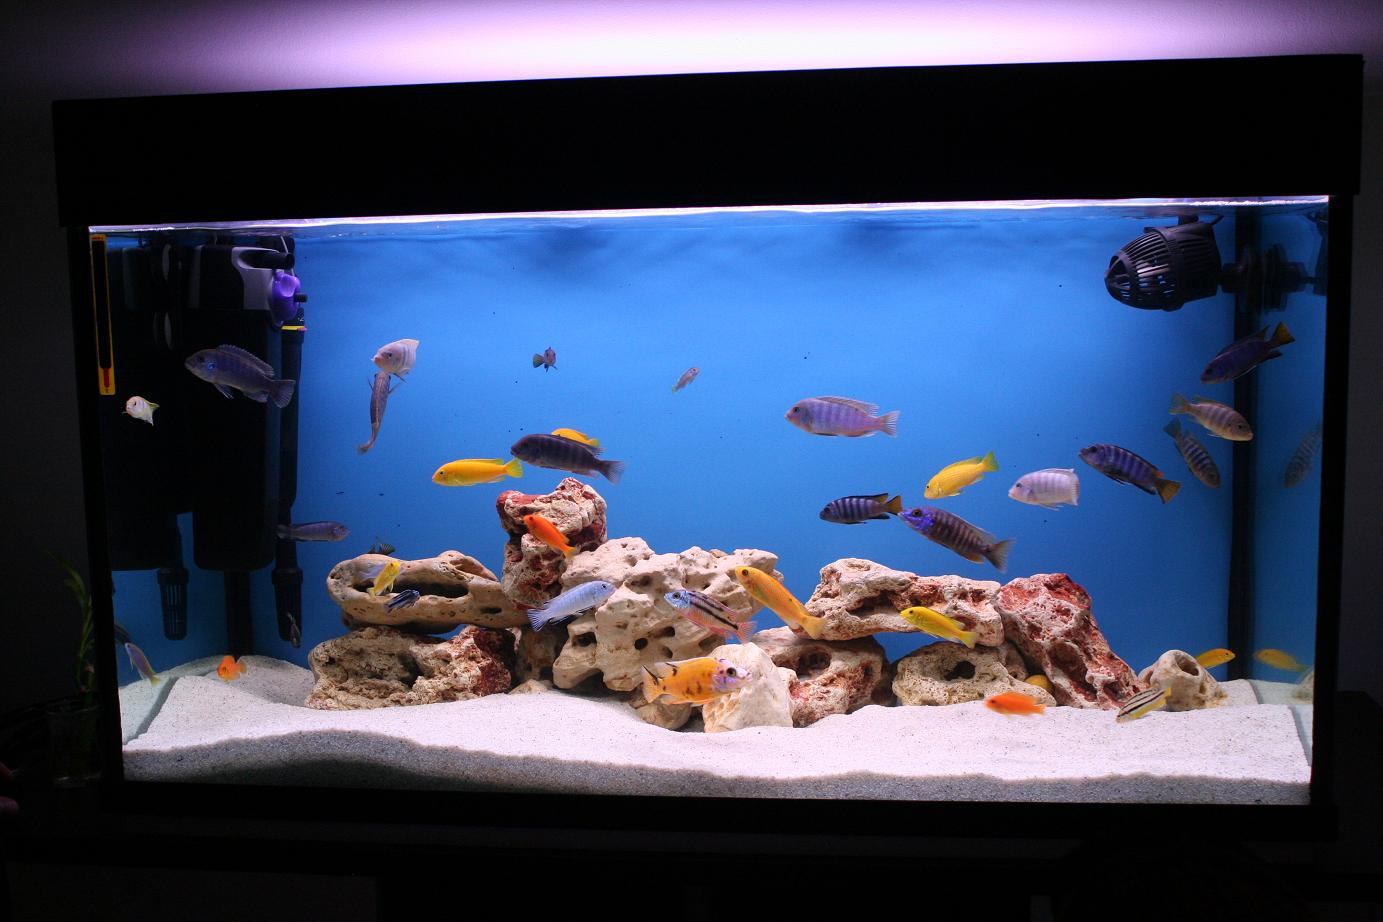 Fish tank home made decorations 88391 mission spot dorrrrrrr for Fish tank video